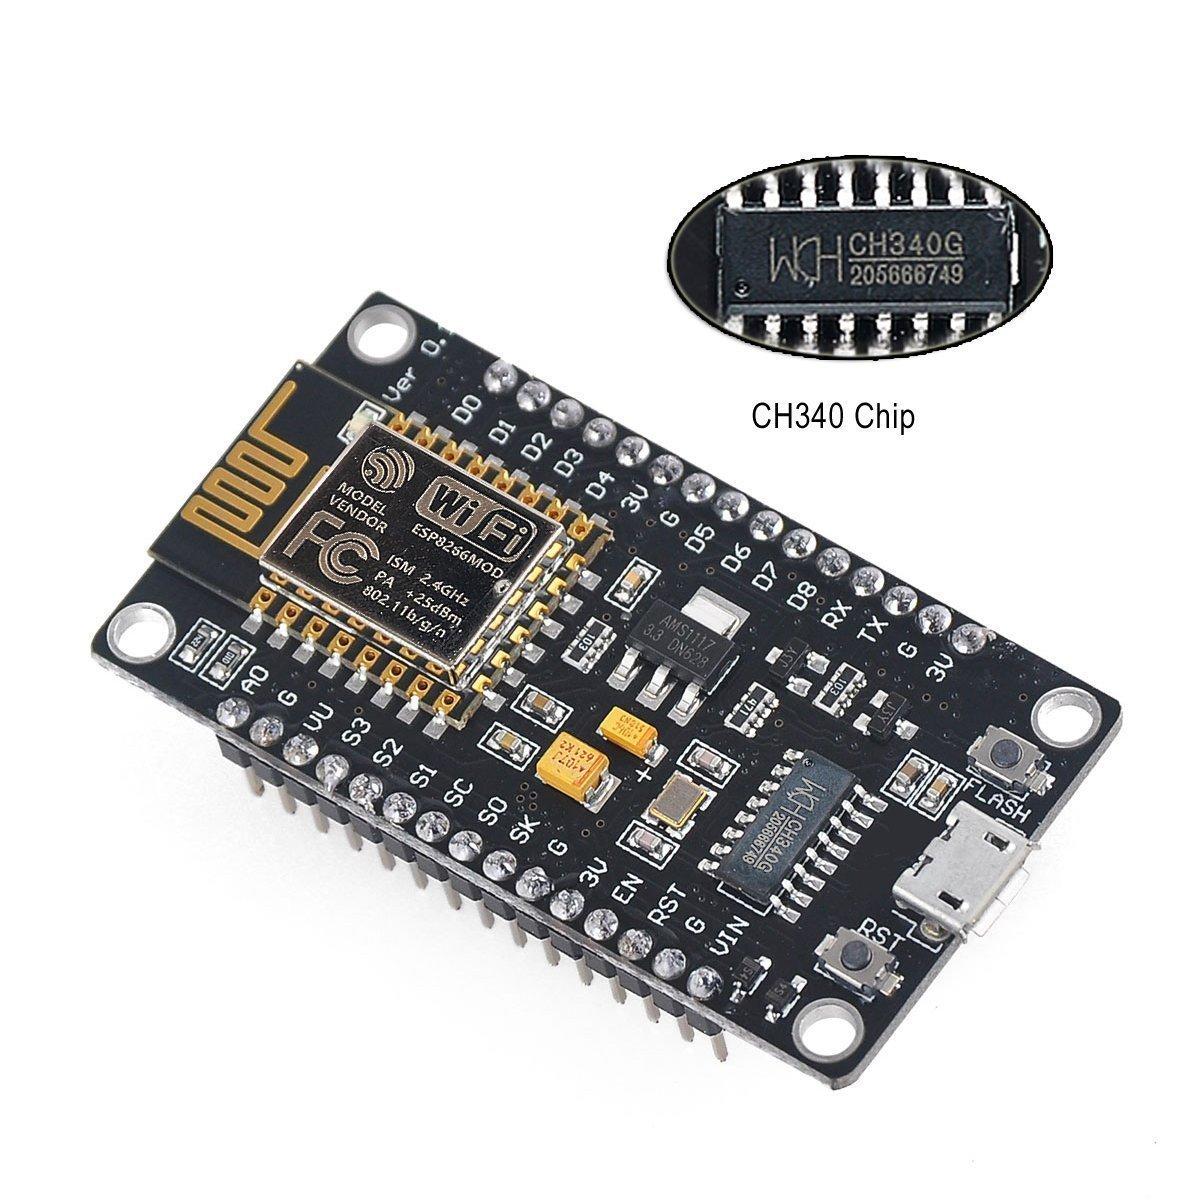 MakerFocus 2pcs ESP8266 NodeMcu Serial Wireless Arduino Wifi Module CH340 NodeMcu Arduino V3 Lua WIFI IOT Development New Version Esp8266 Development Board For Arduino Project by MakerFocus (Image #3)